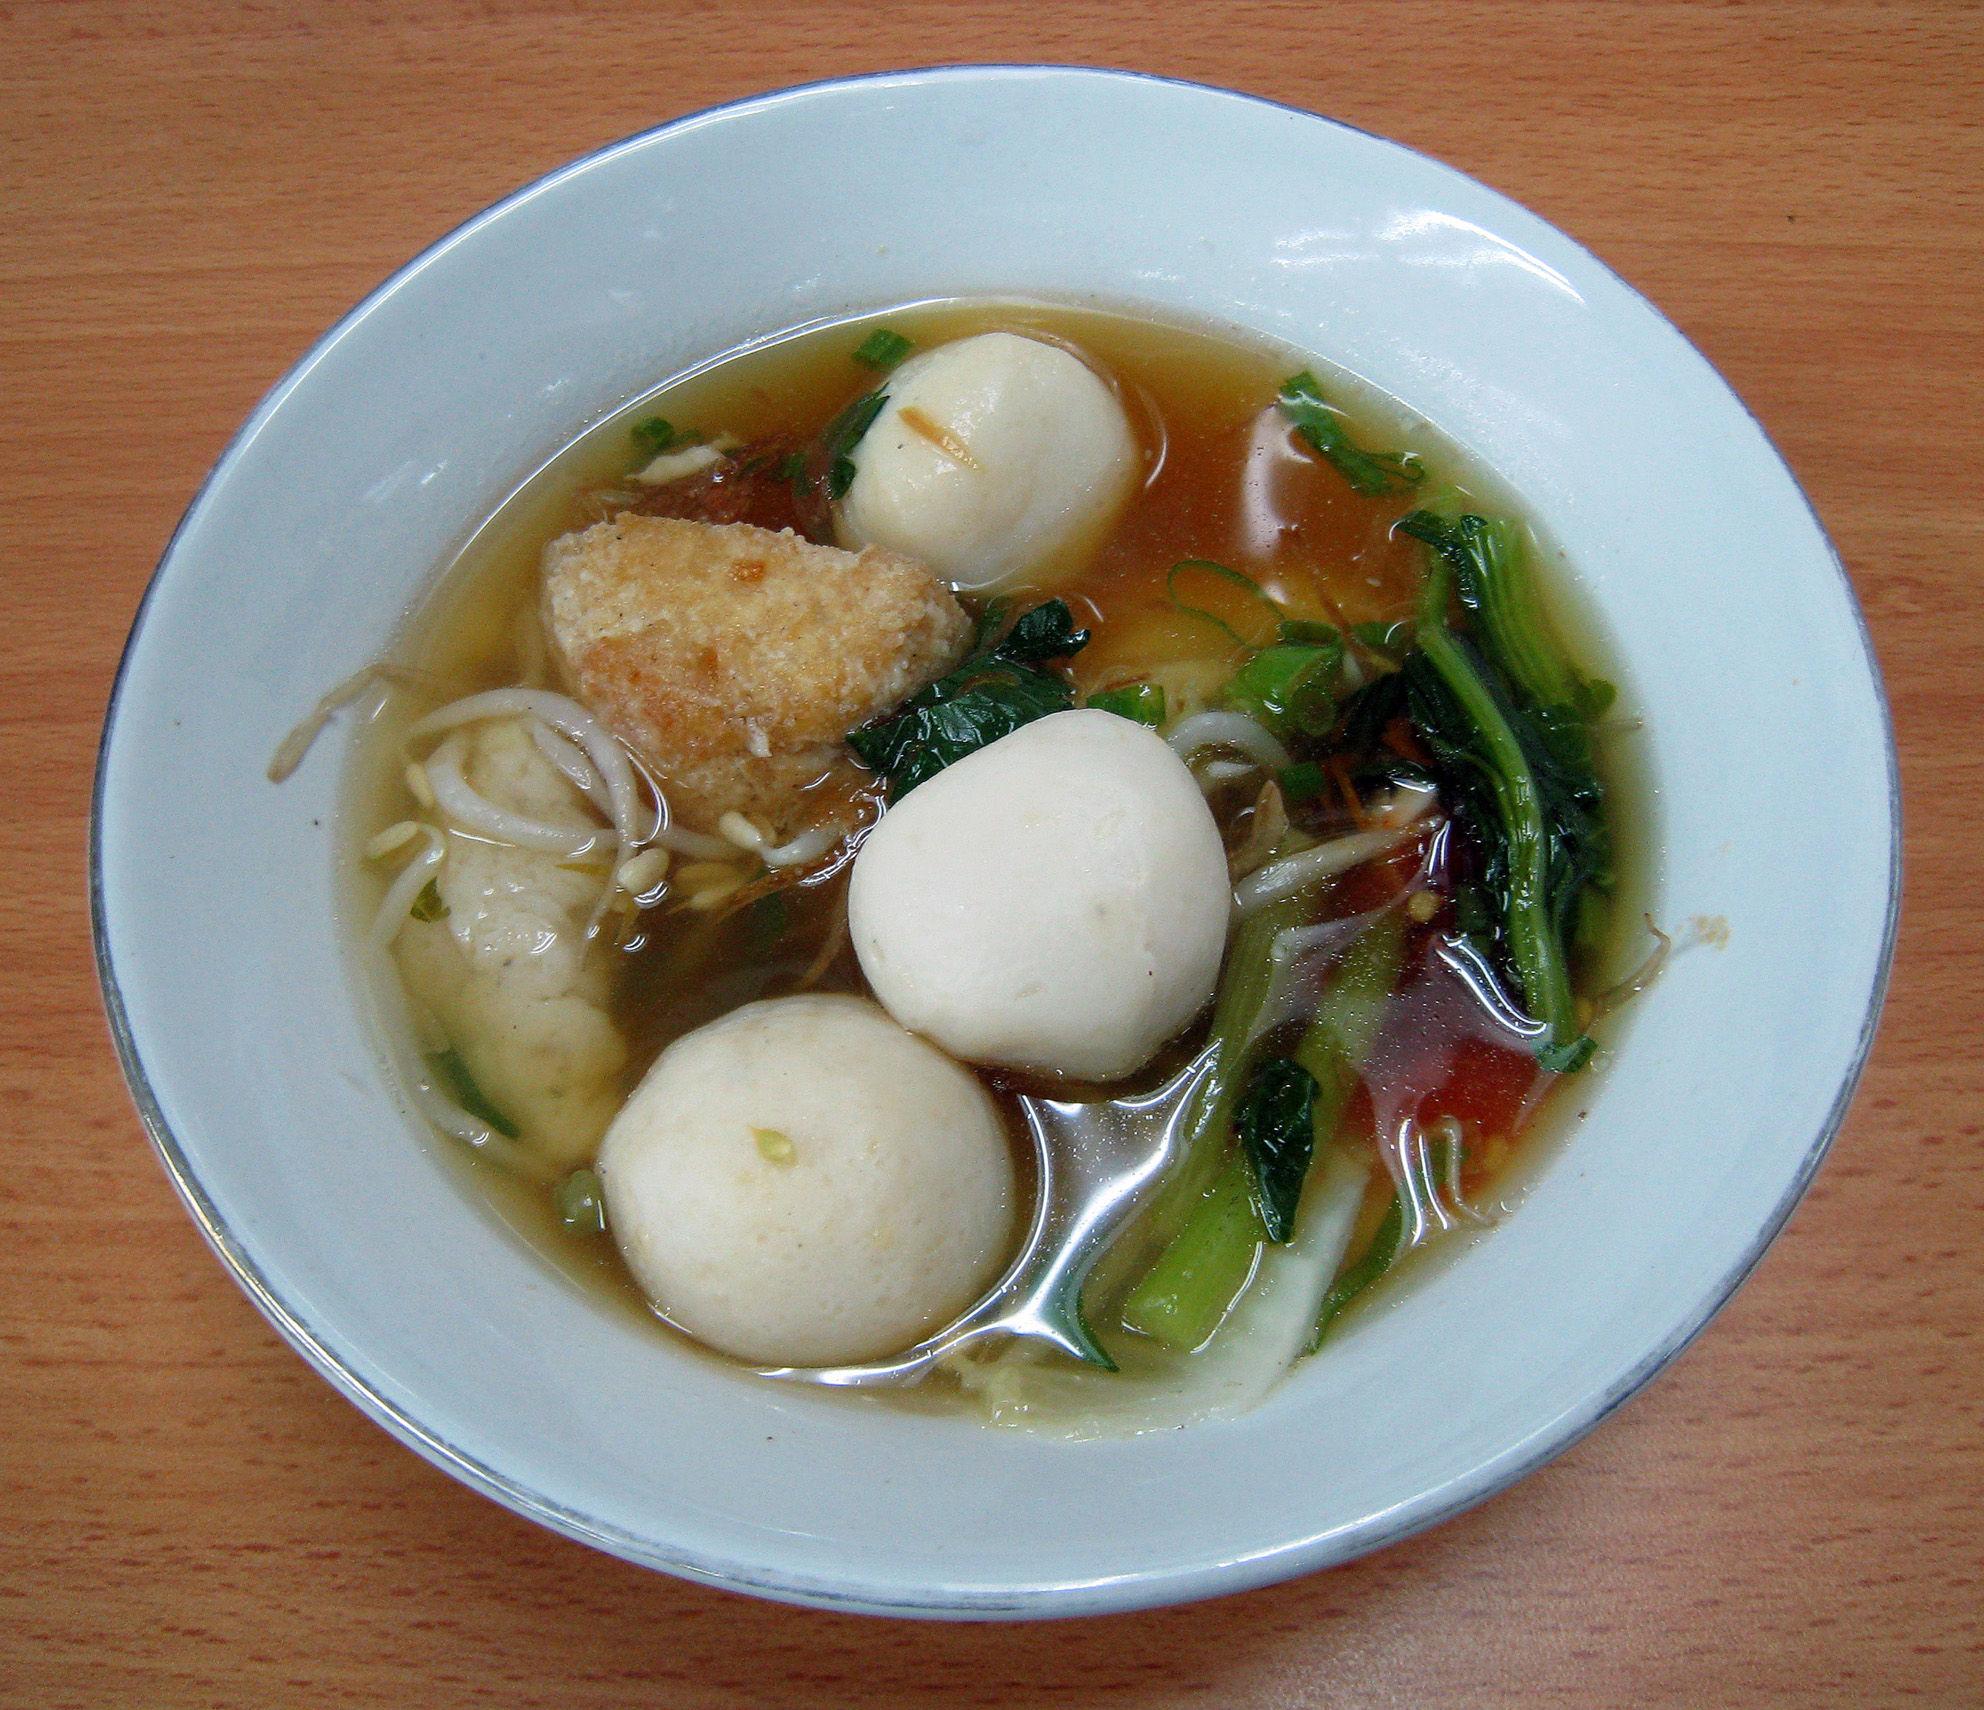 Turnip-greens-recipe-2